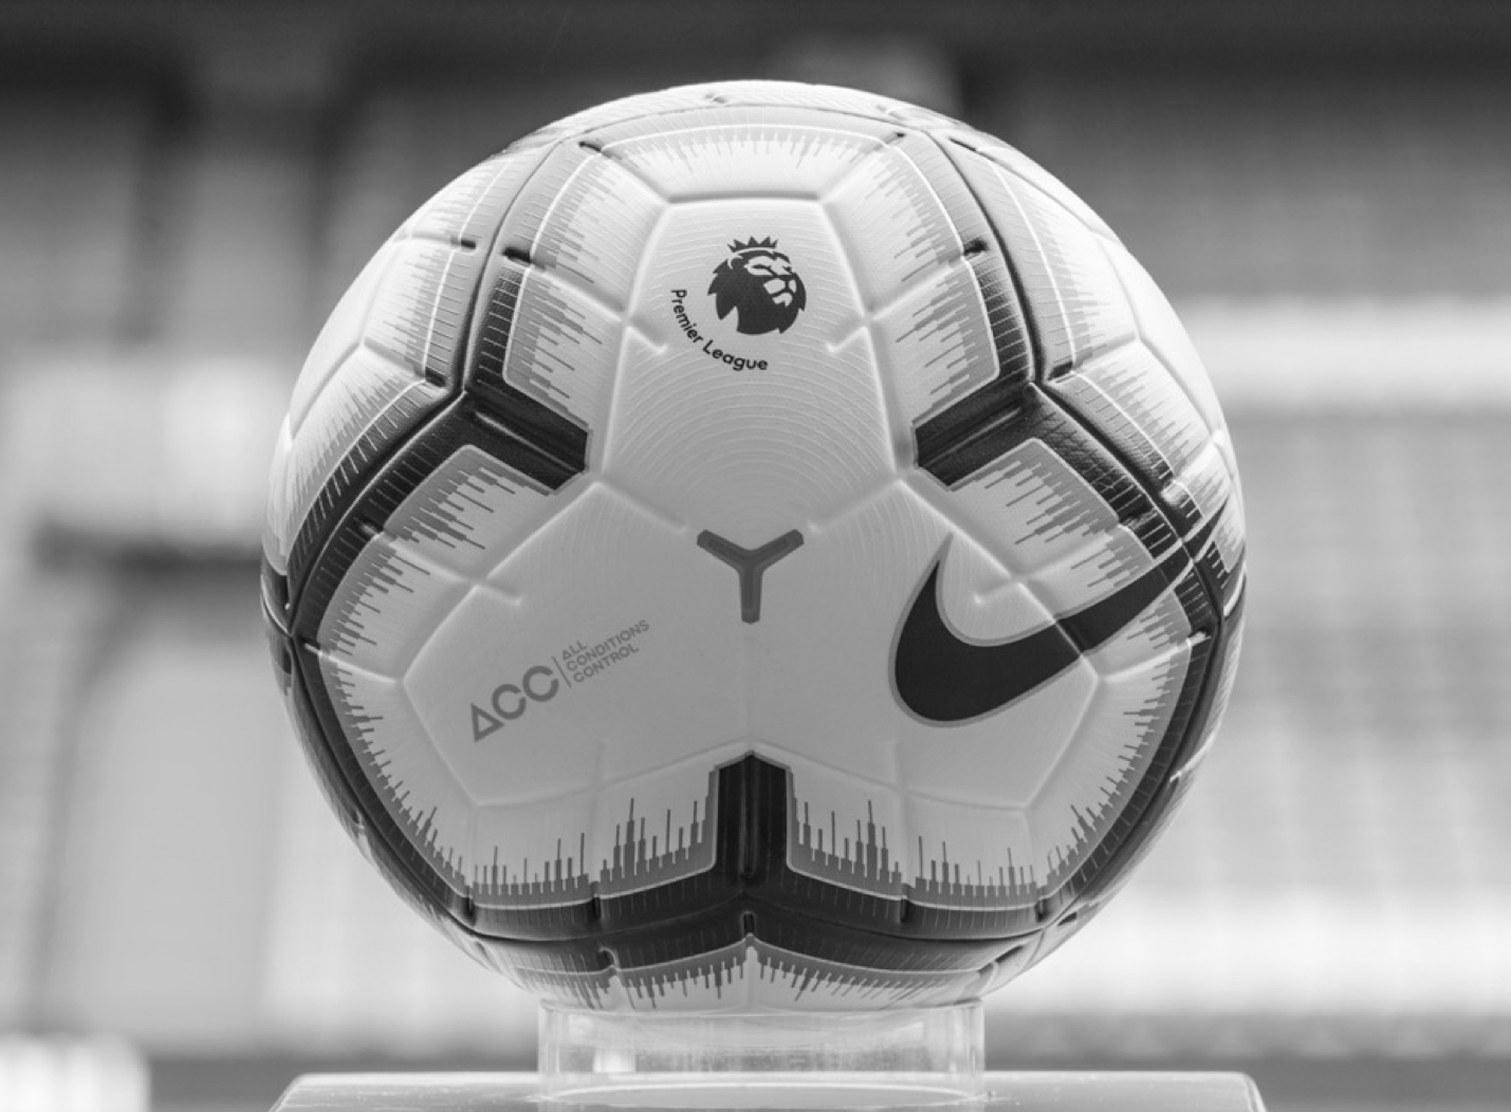 Nuevo balón Nike Merlin 2018-19 | Foto Nike